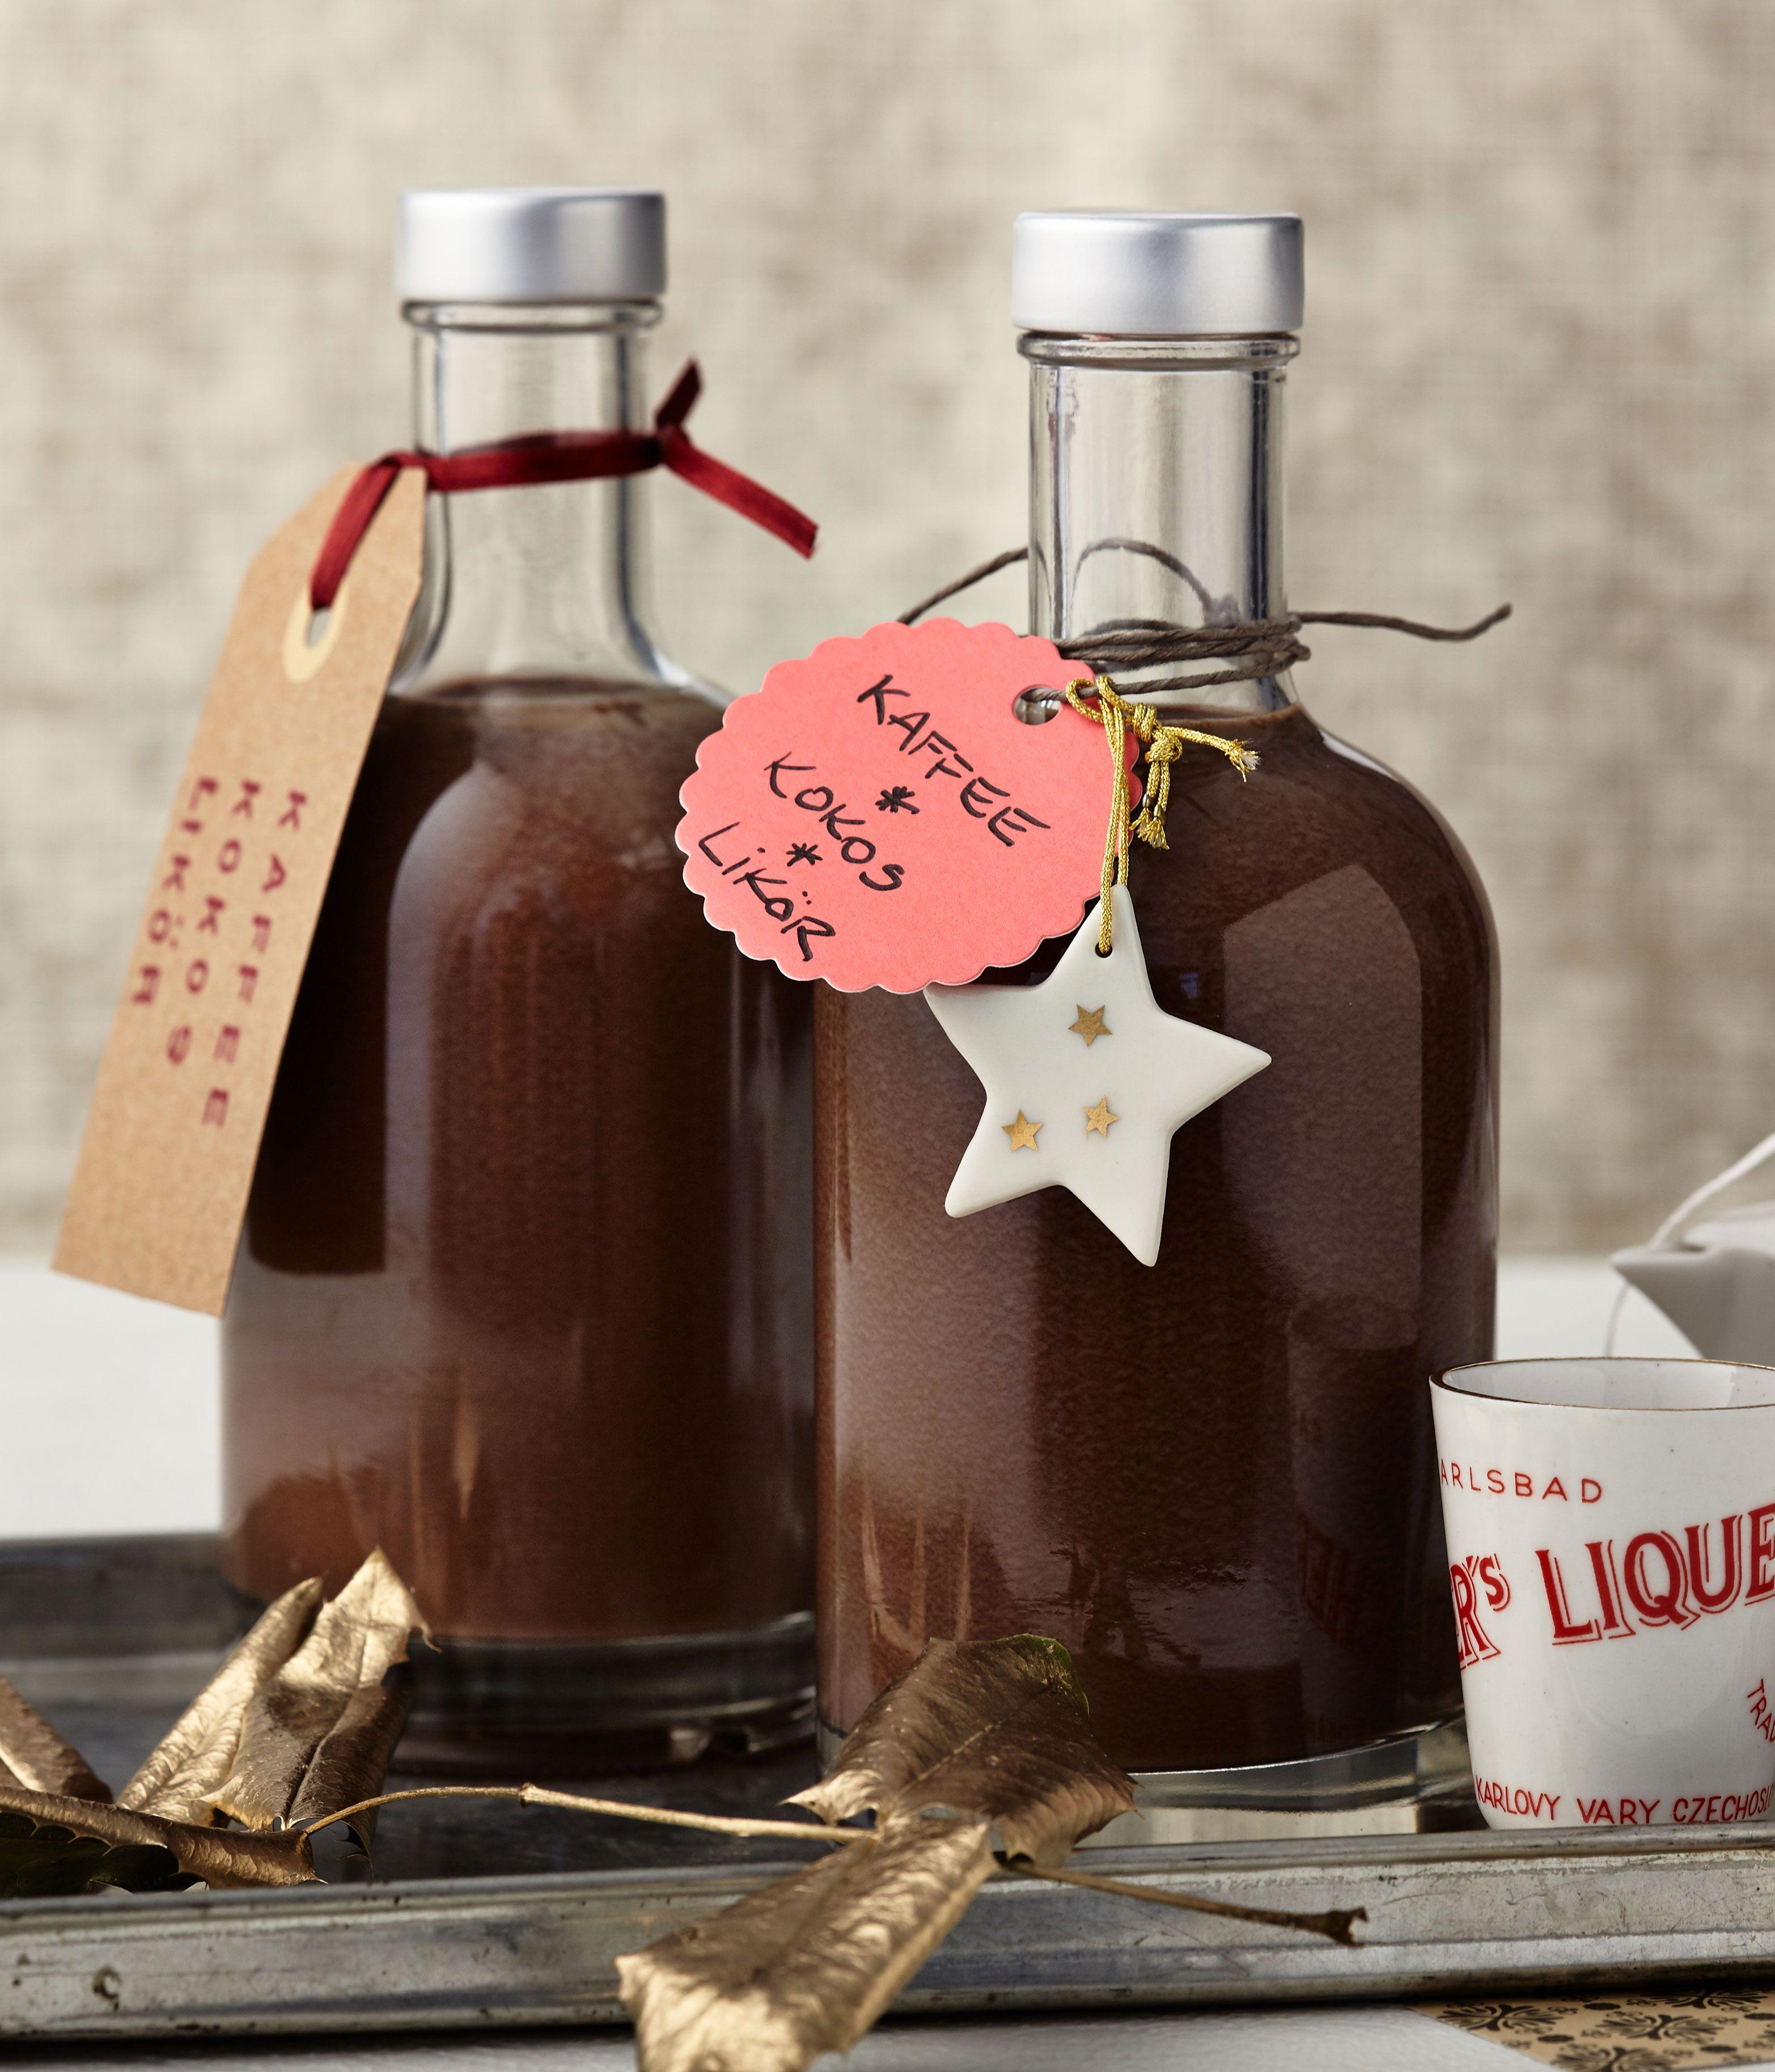 Schneller Kaffee-Kokos-Likör   Rezept   Liköre, Getränke und Sirup